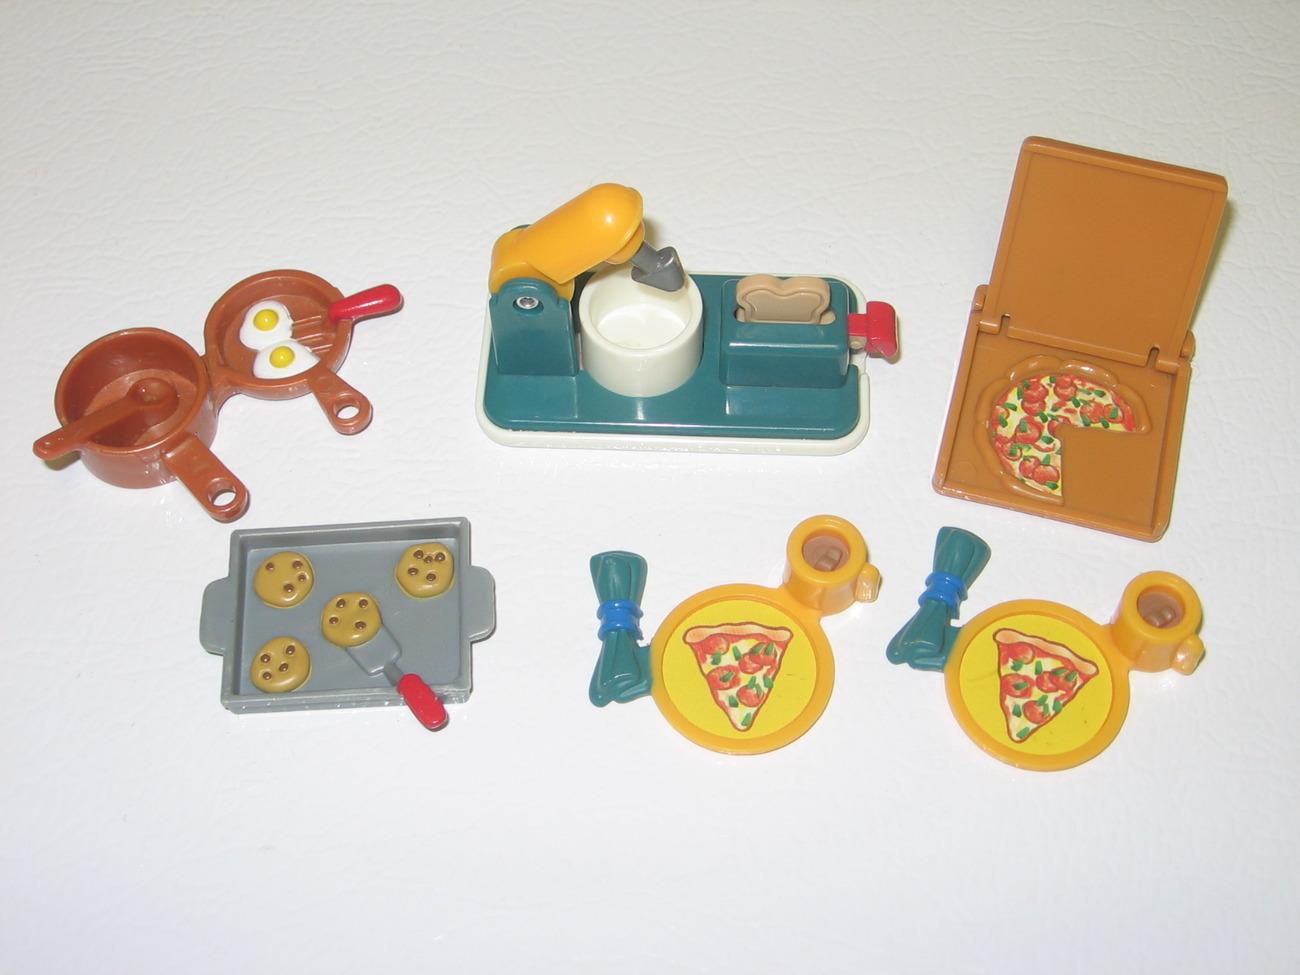 Fisher Price Loving Family 1999 Cooking Fun Play Set w/ Mixer Toaster - $23.99